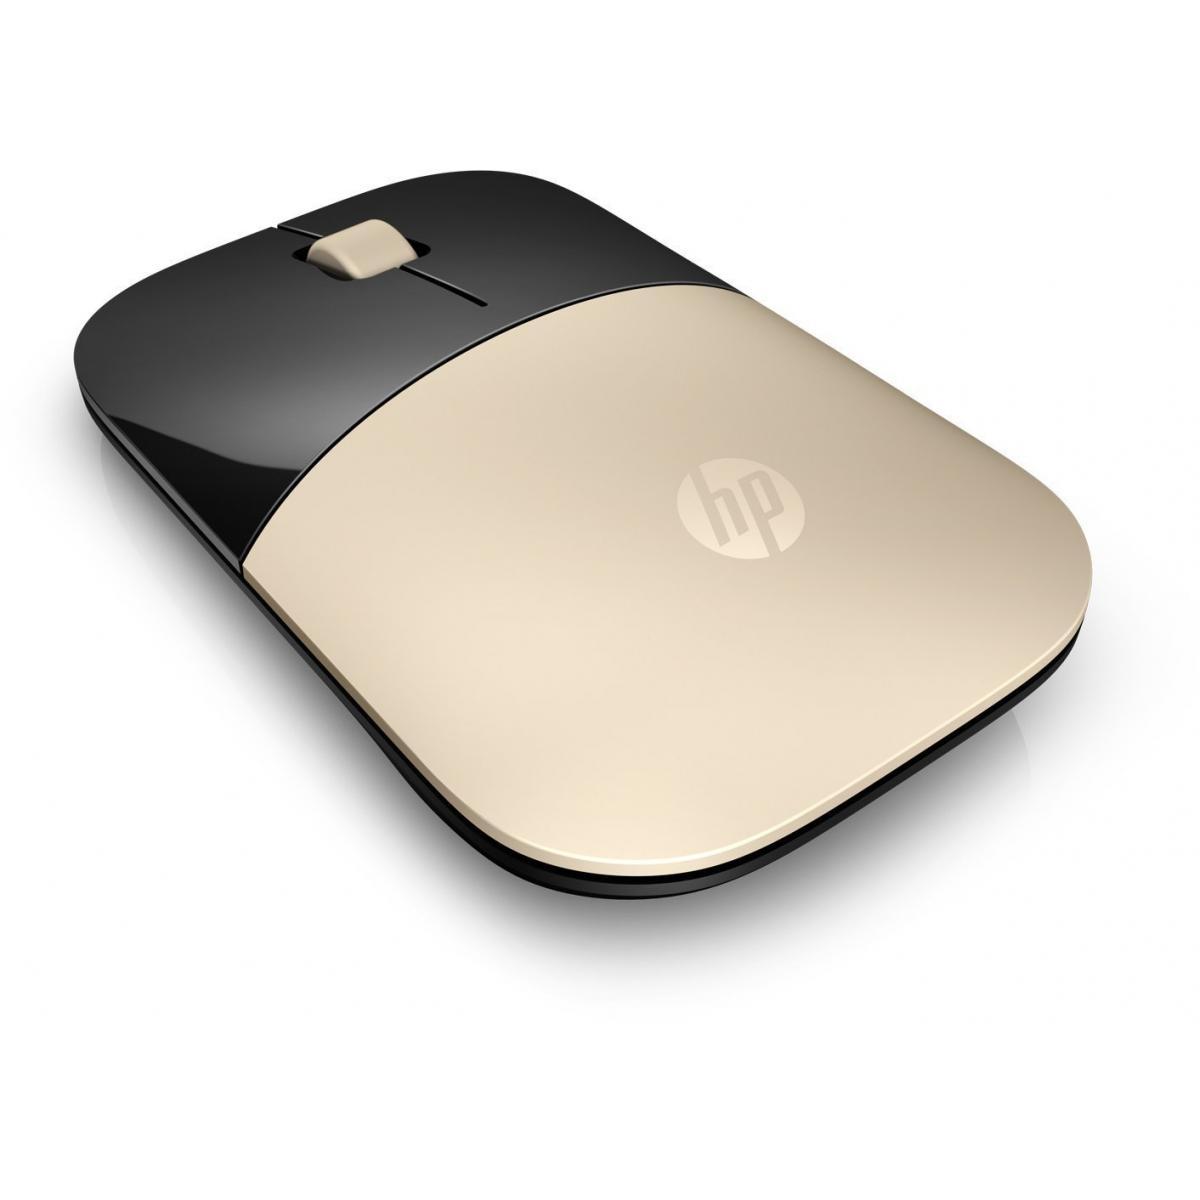 Accessories Hp Gts Amman Jordan Mouse Gaming M 150 Wireless Z3700